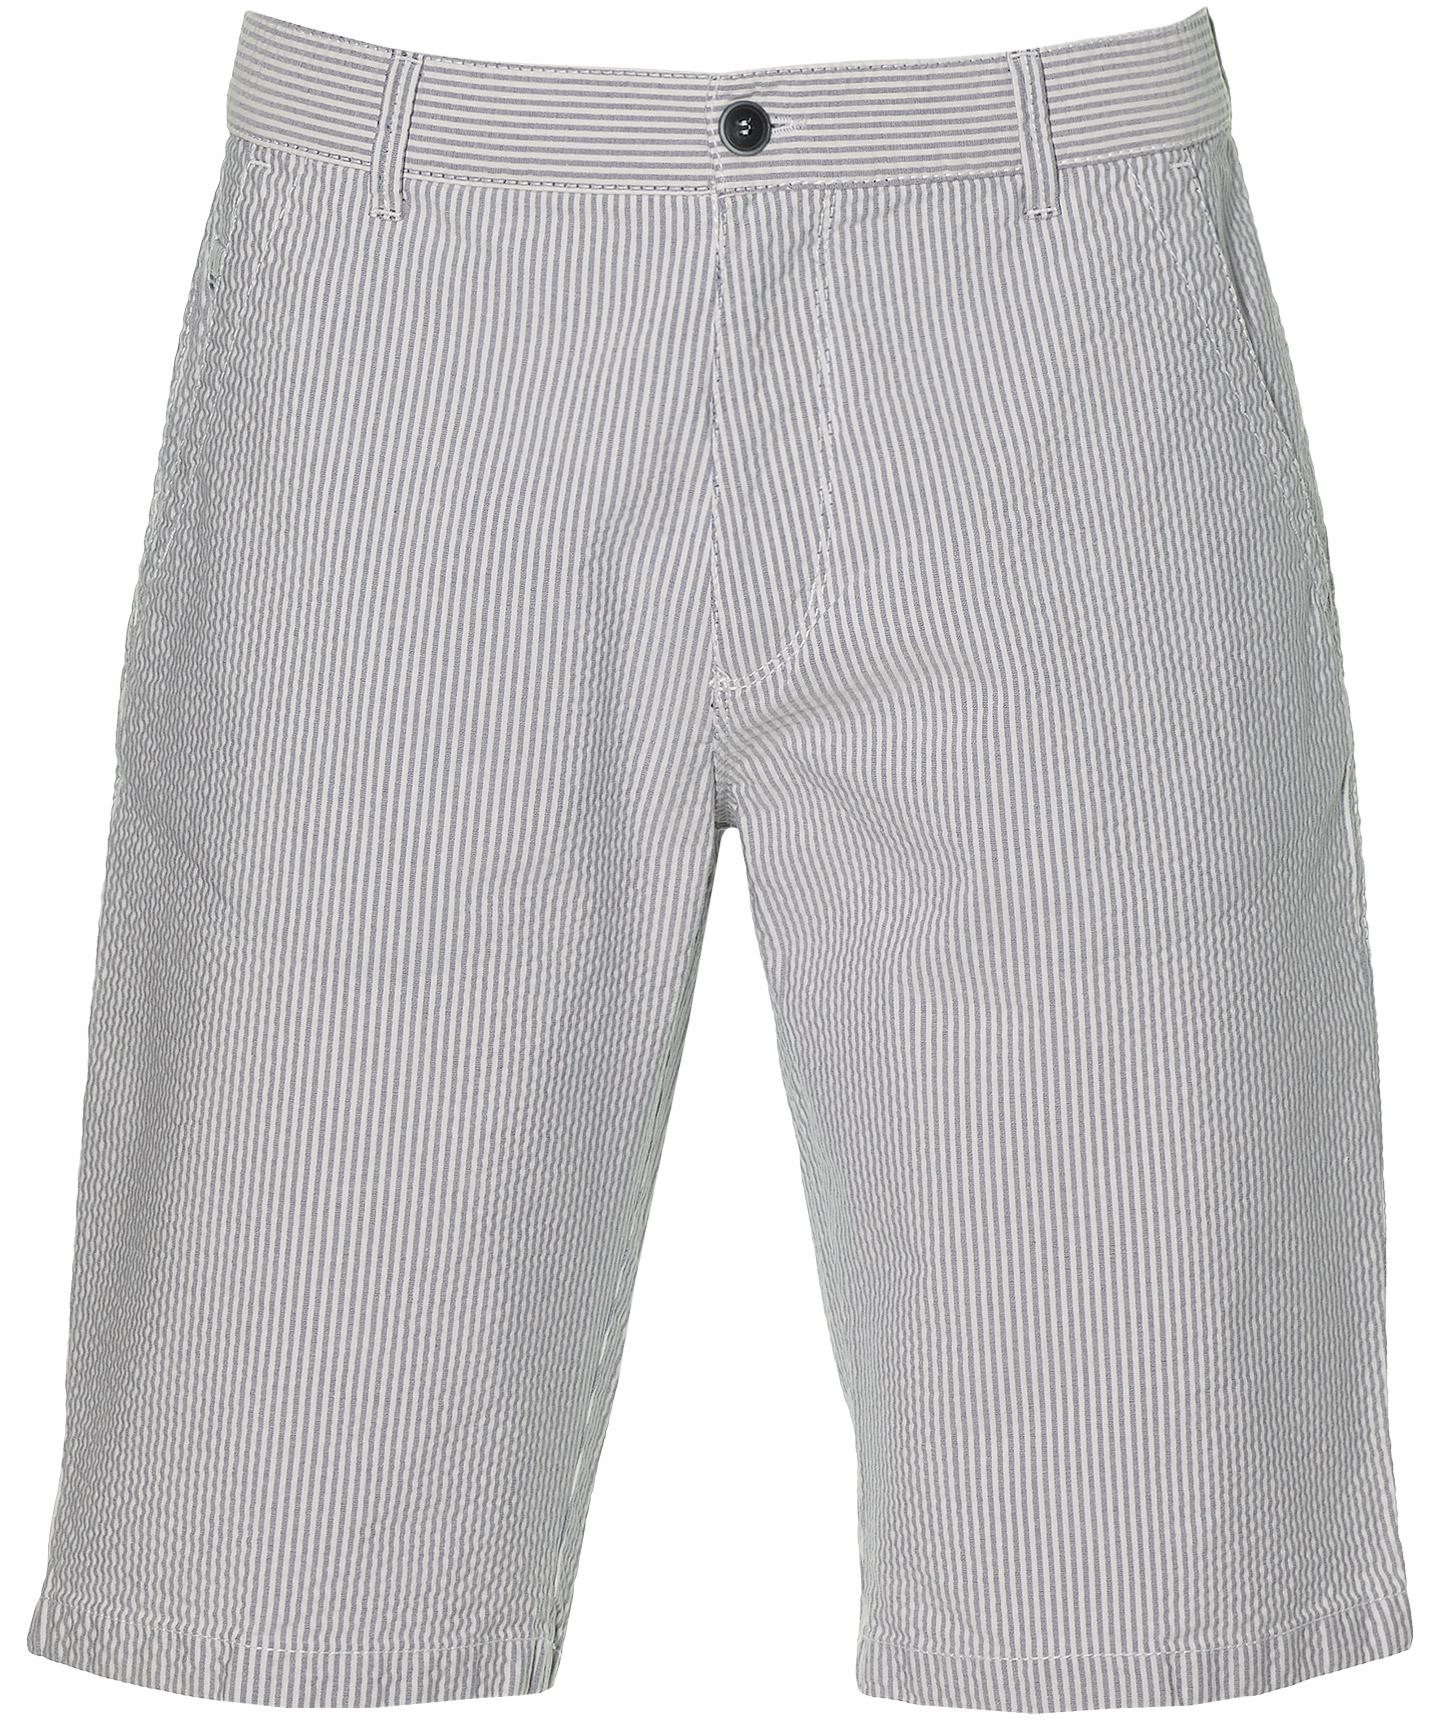 Pionier Short Luca - Regular Fit - Blauw